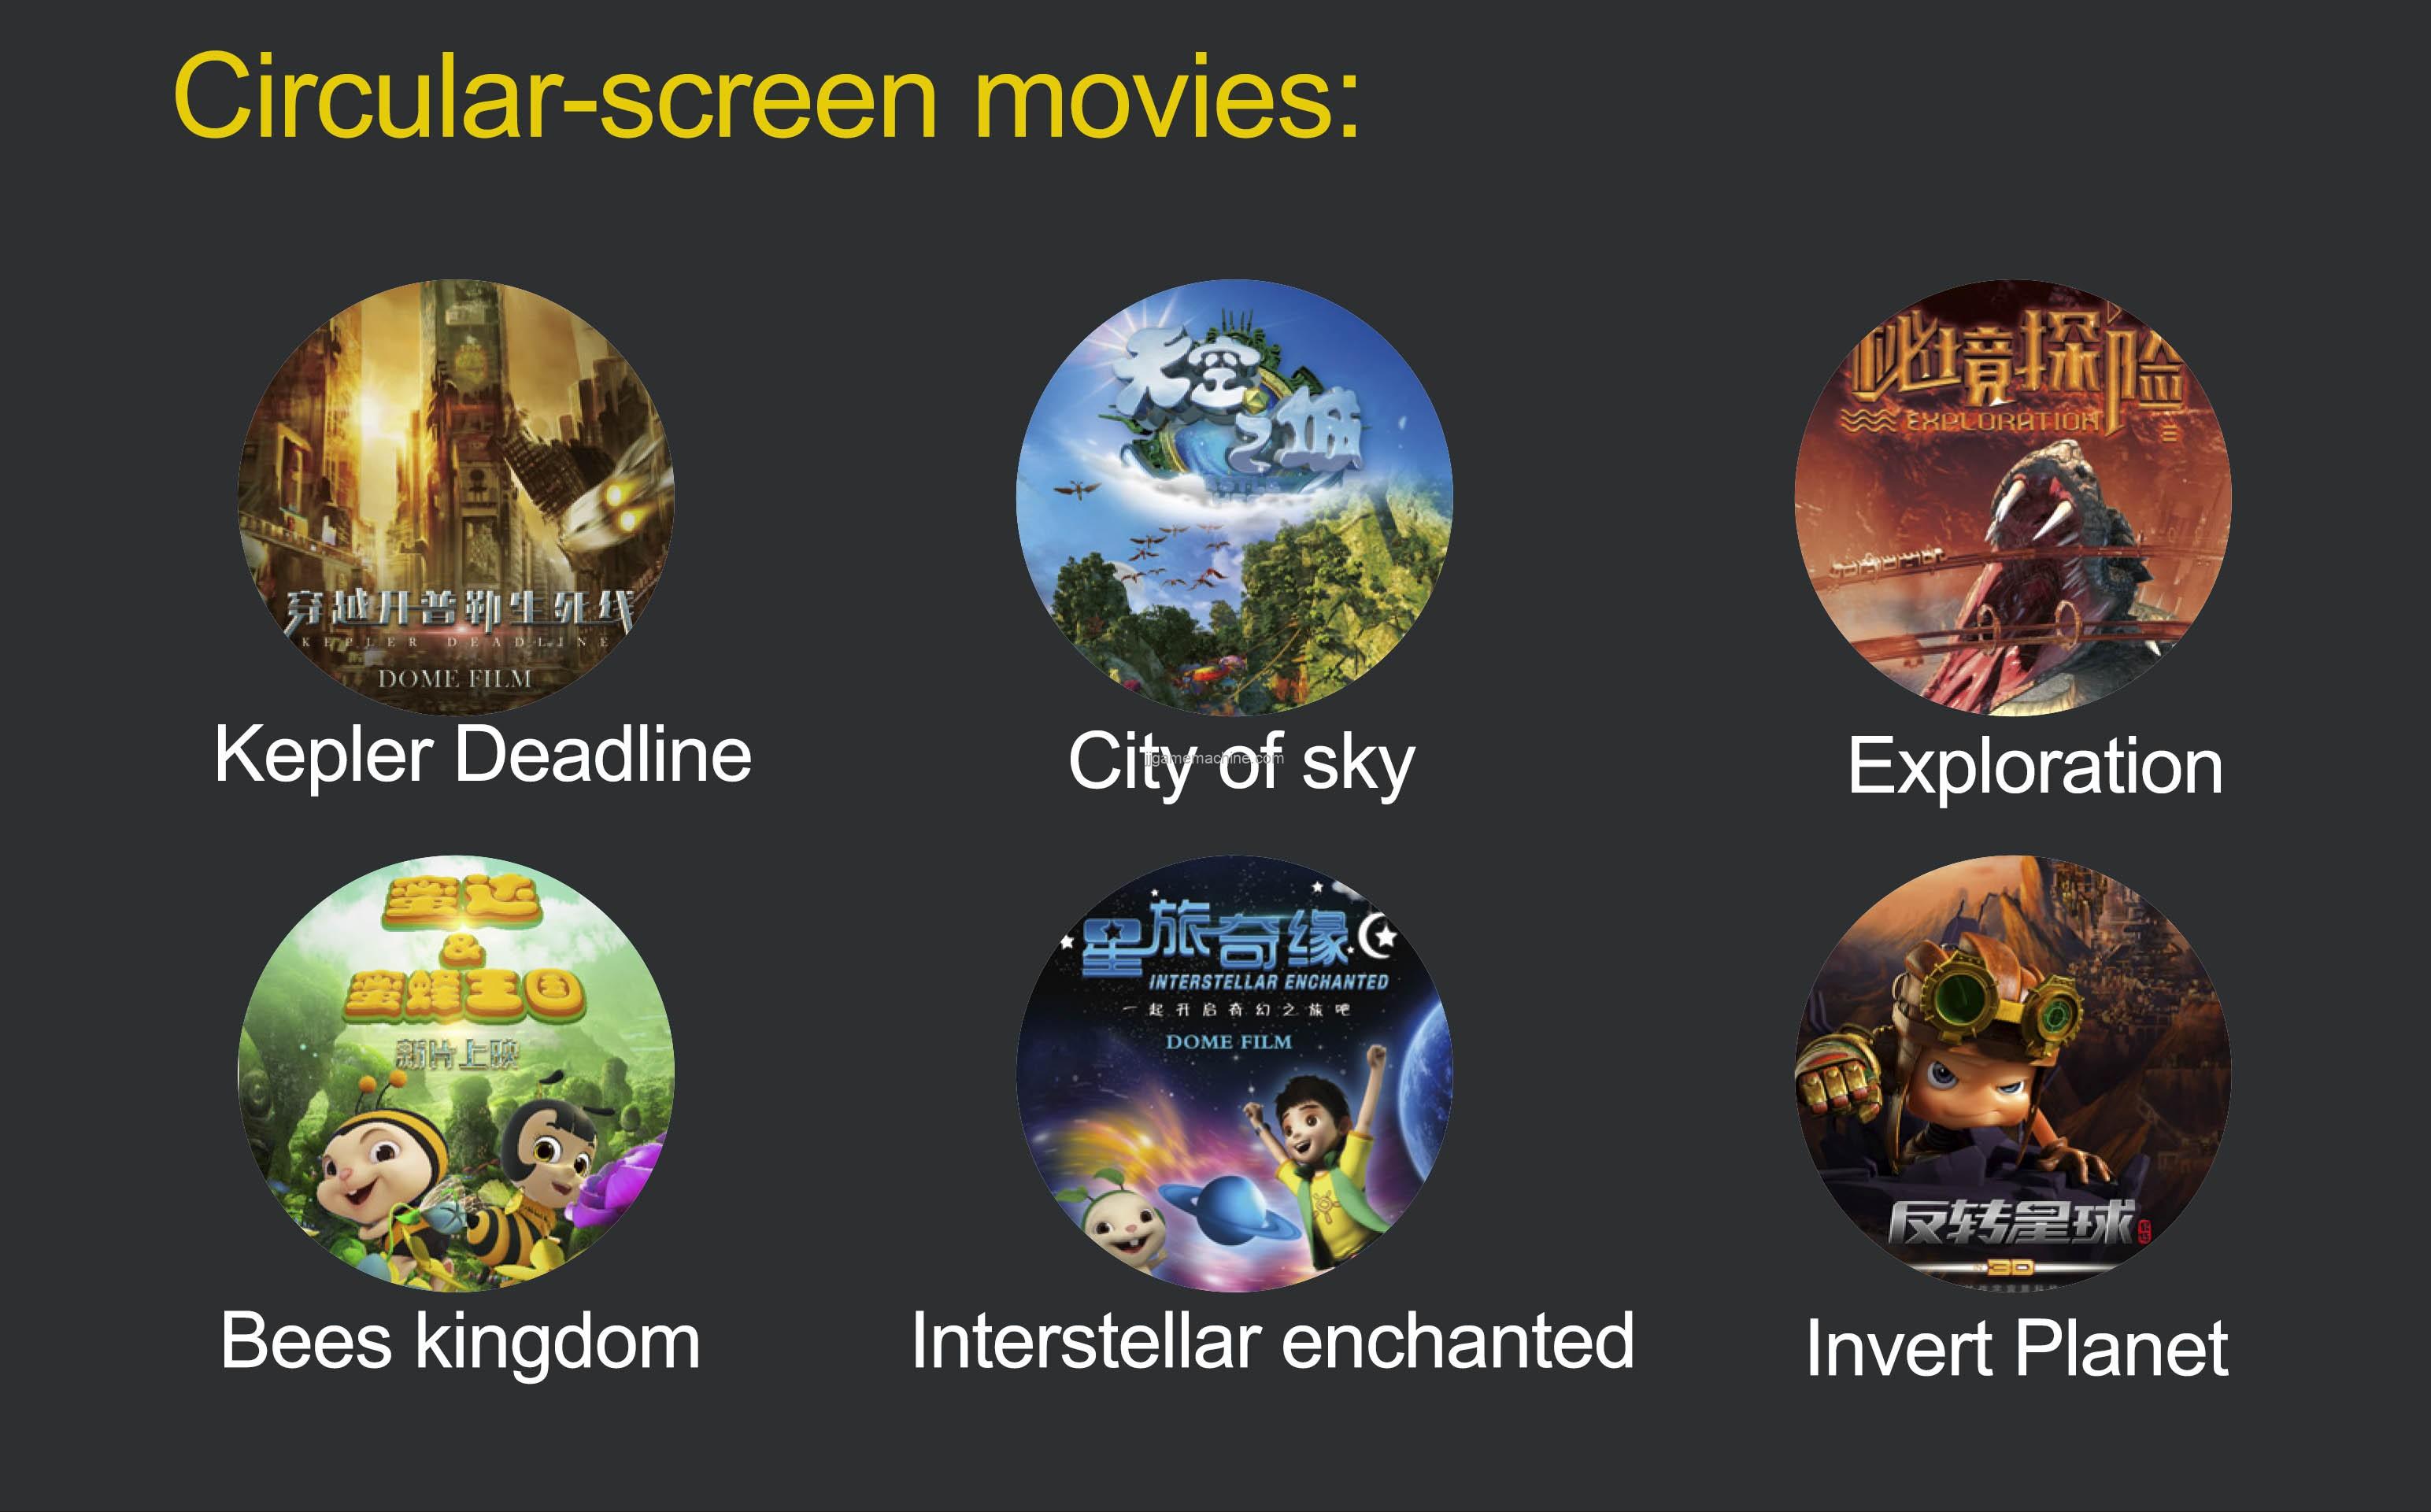 Virtual Reality machine high income circular-screen movie 9d vr cinema